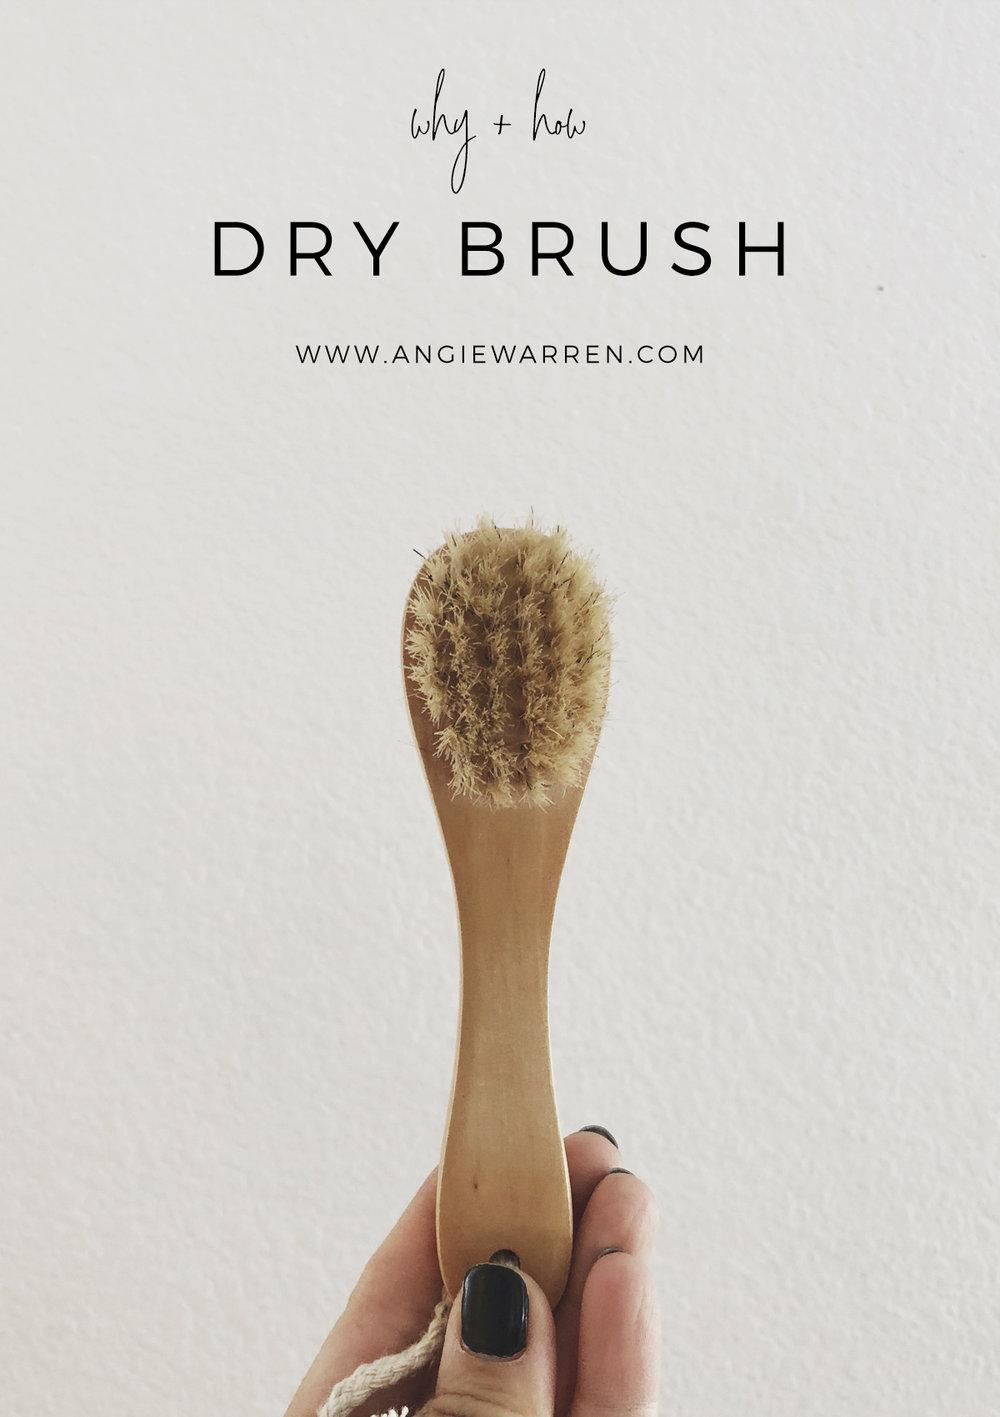 Dry Brushing / www.angiewarren.com